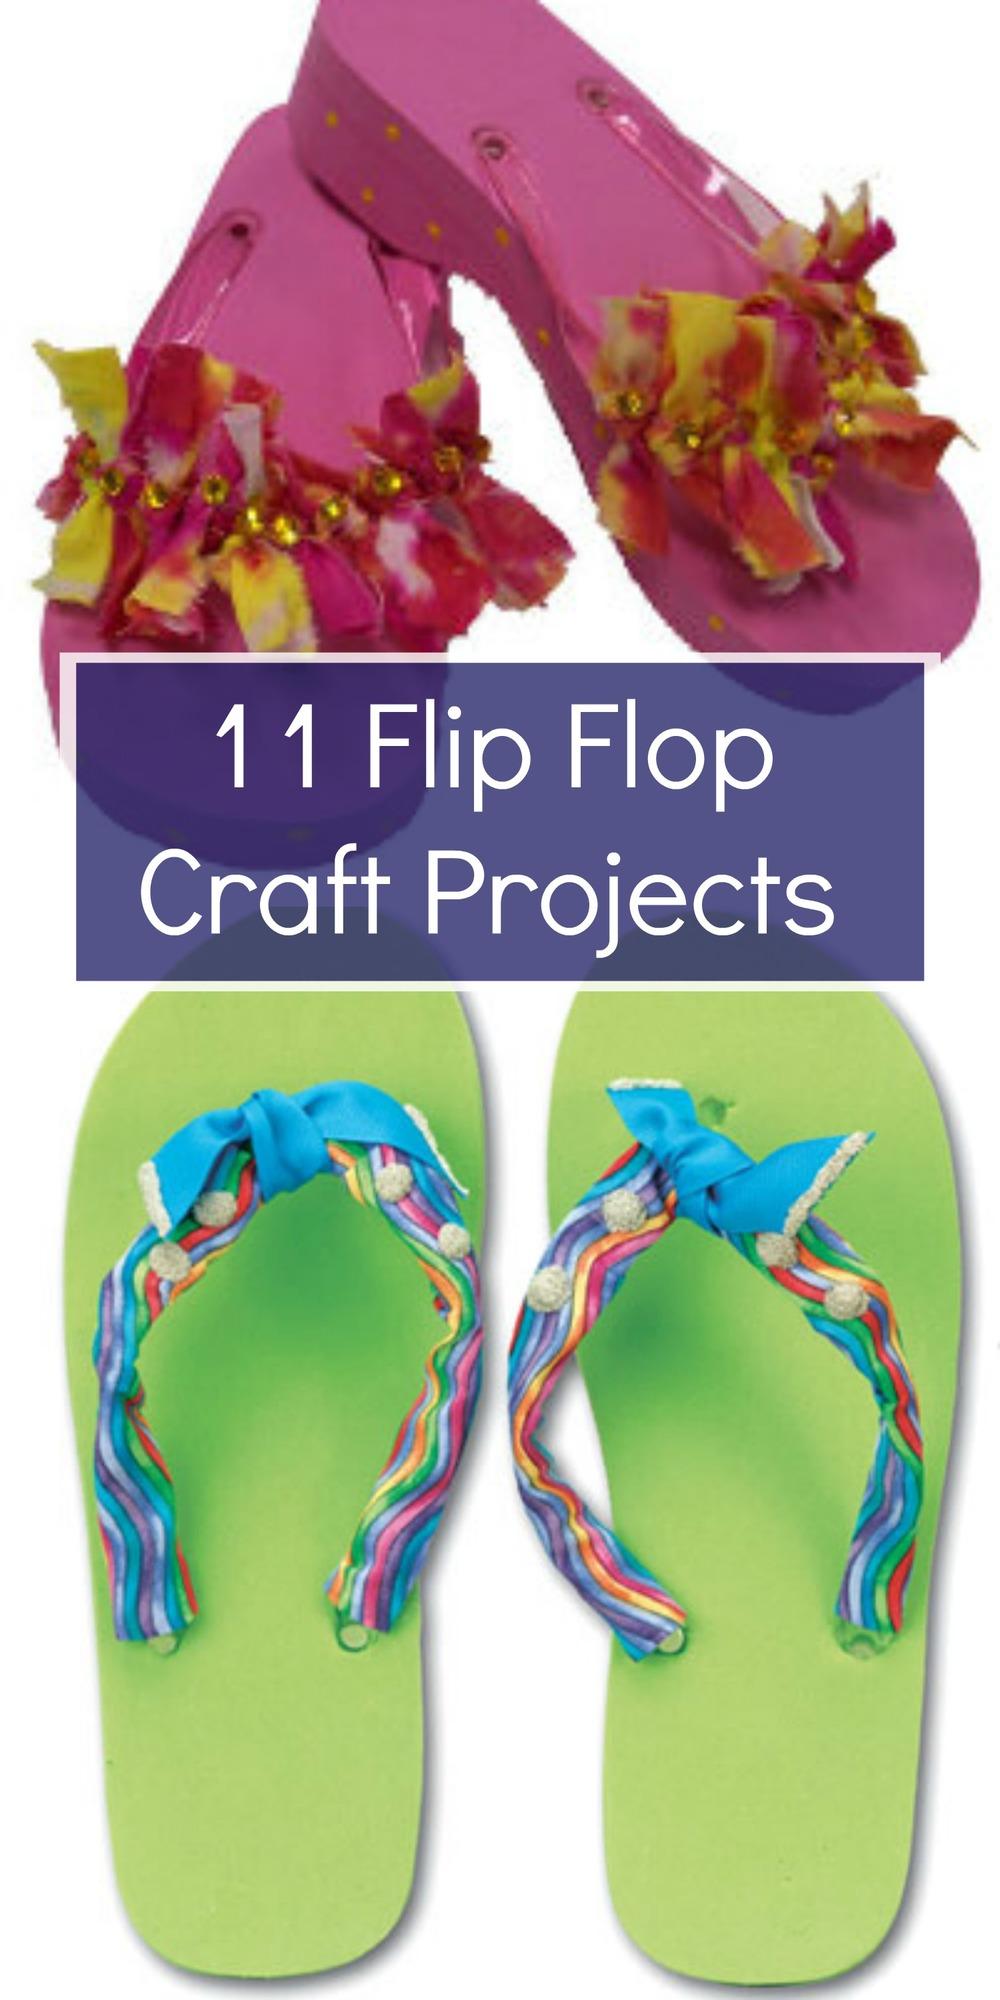 11 flip flop craft projects for Flip flops for crafts